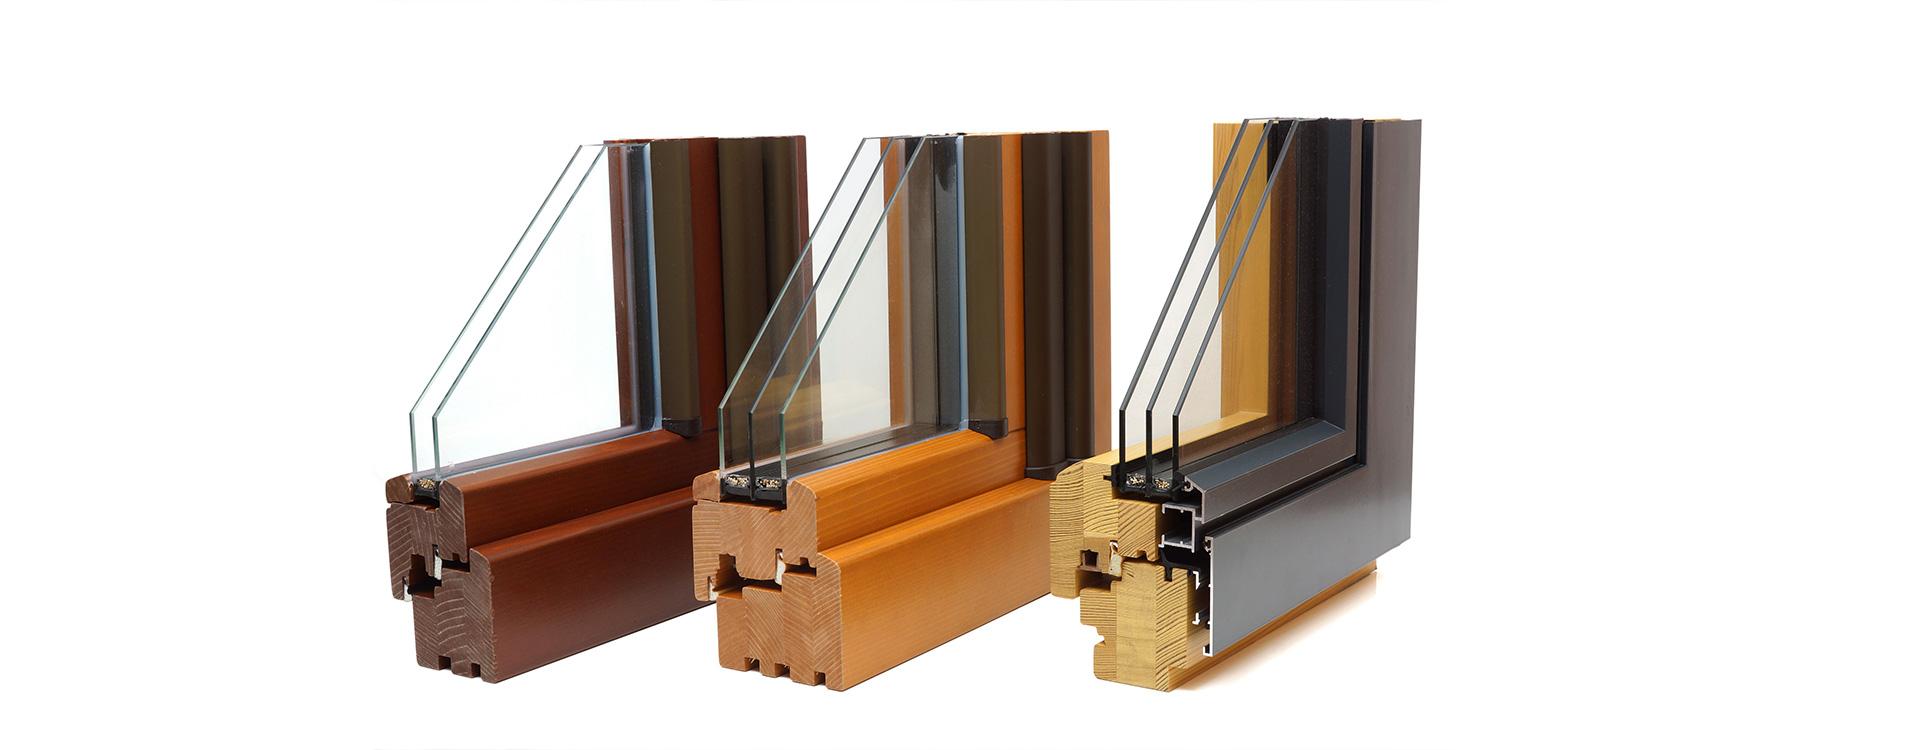 serramenti-in-legno